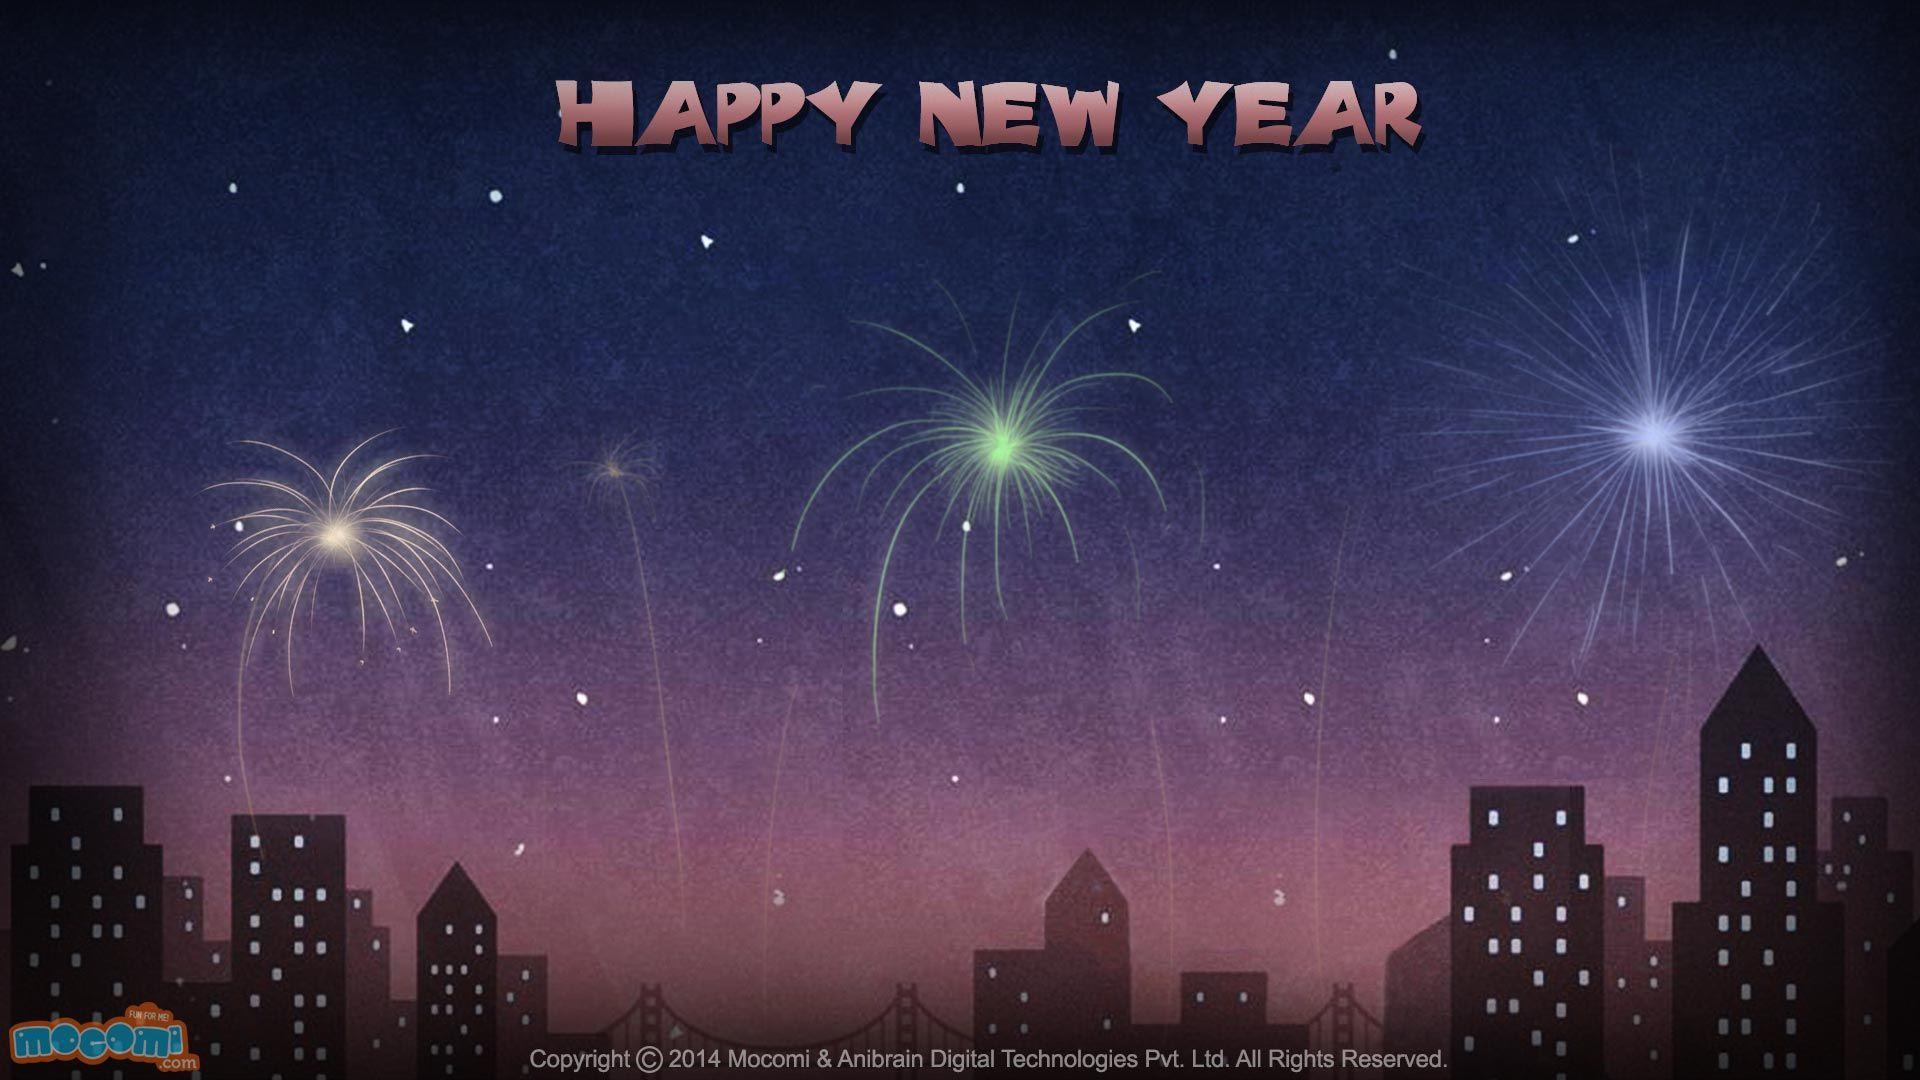 Happy New Year Wallpaper 12 Desktop Wallpaper for Kids